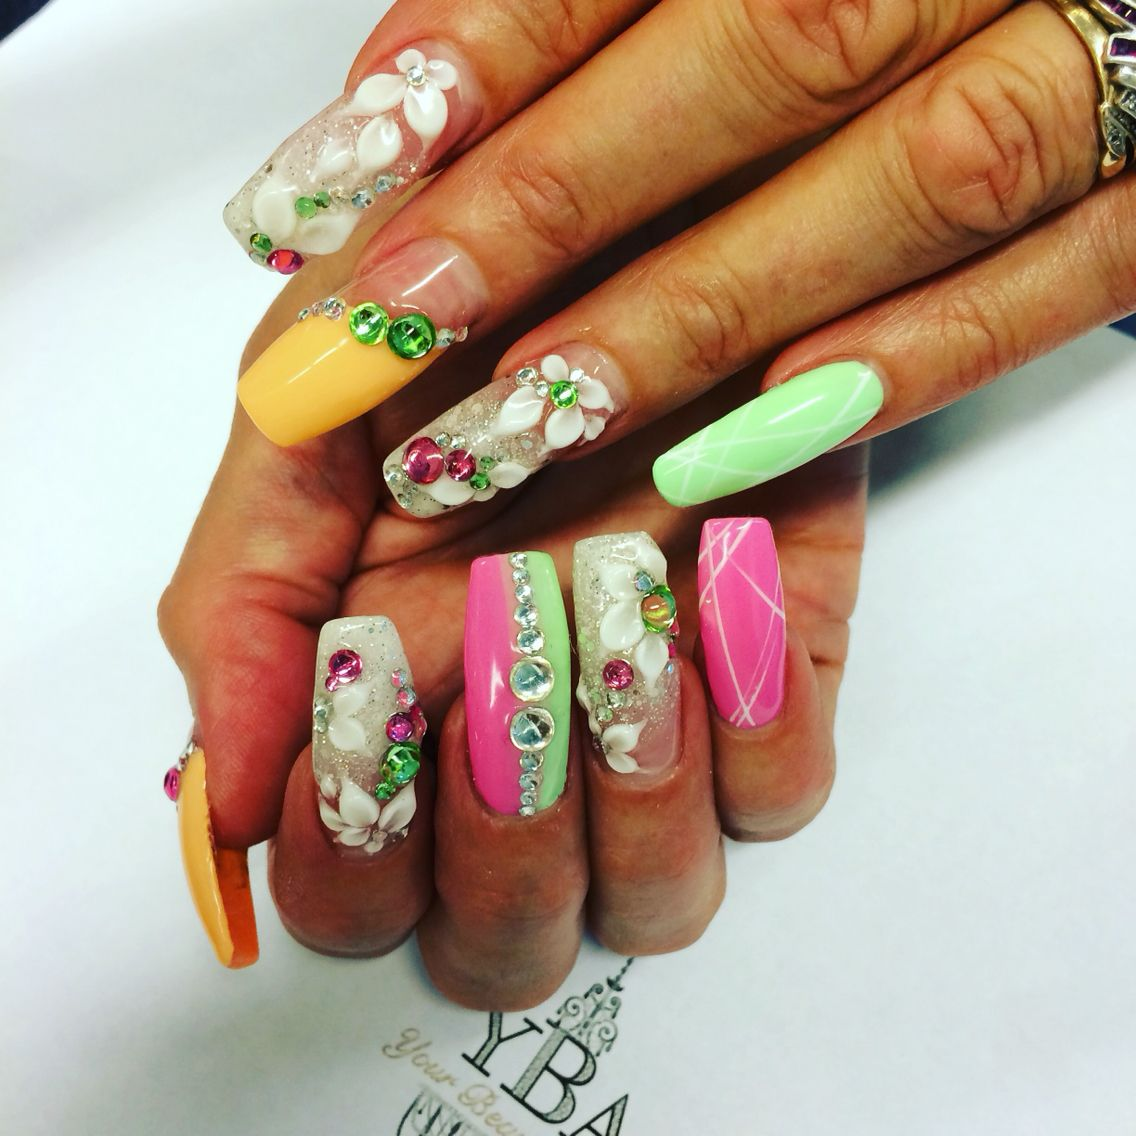 Stay focused and extra sparkly 😉 your beauty artist Dai #YBA #Beauty #järvenpää #jewels #nails #sparkly